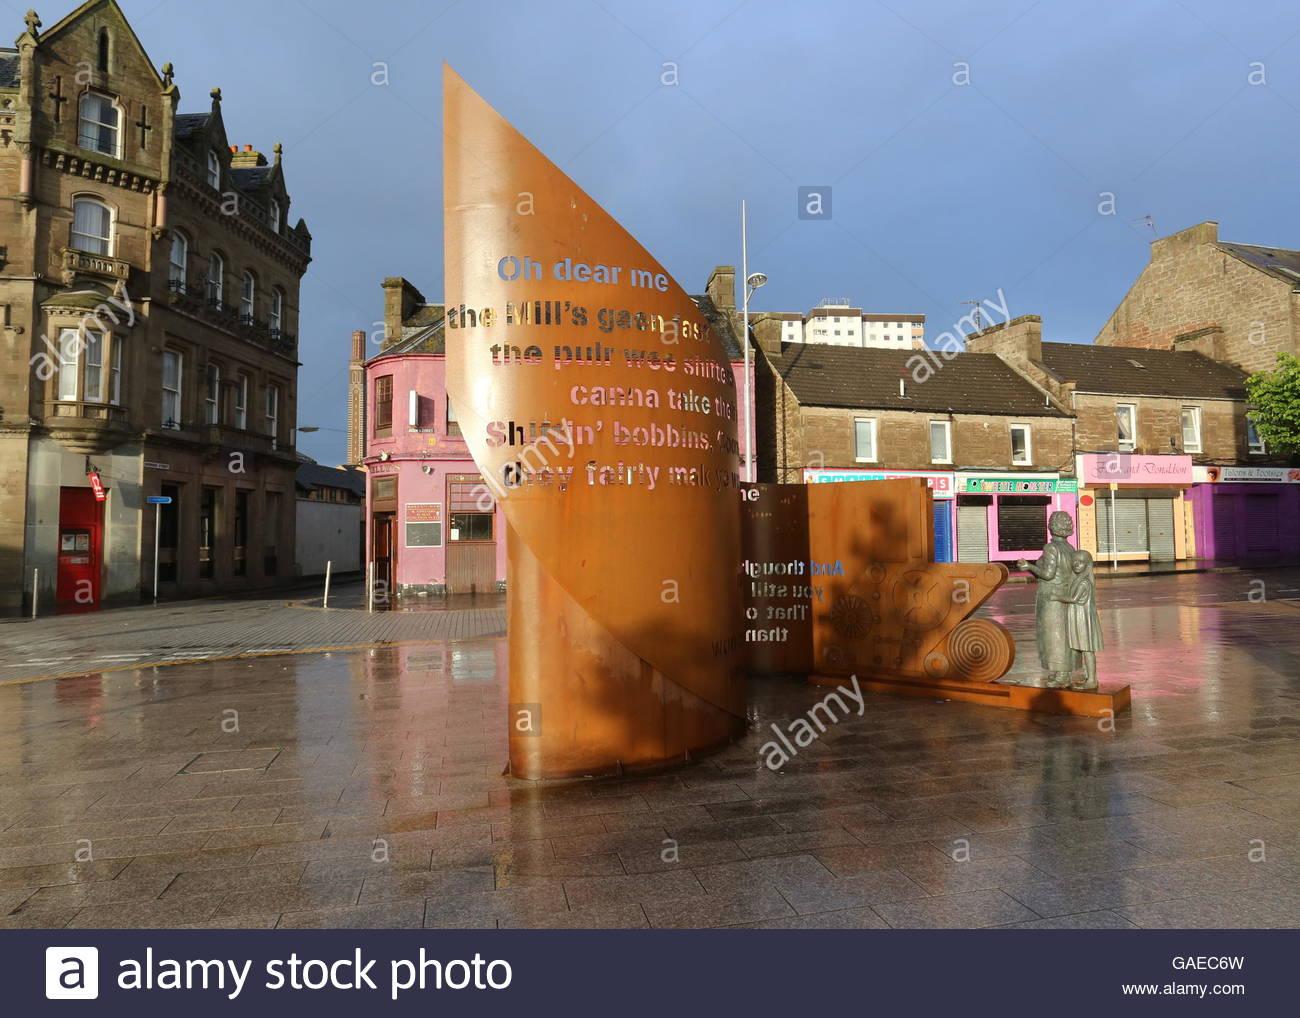 Tribute to Jute Mill women Lochee Dundee Scotland  June 2016 - Stock Image